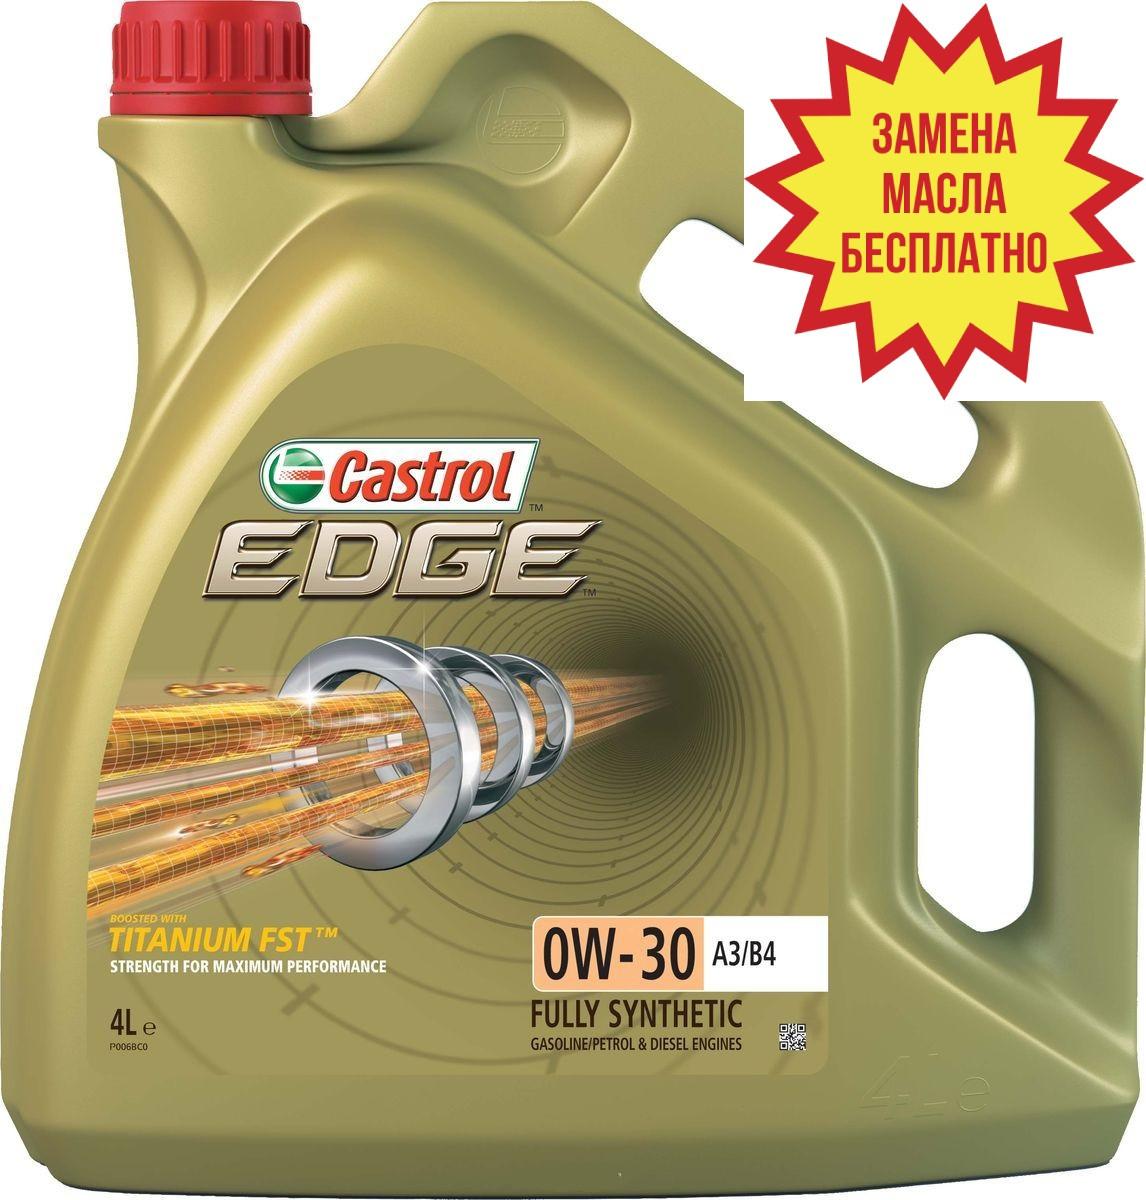 Моторное масло Castrol EDGE 0W-30 4L